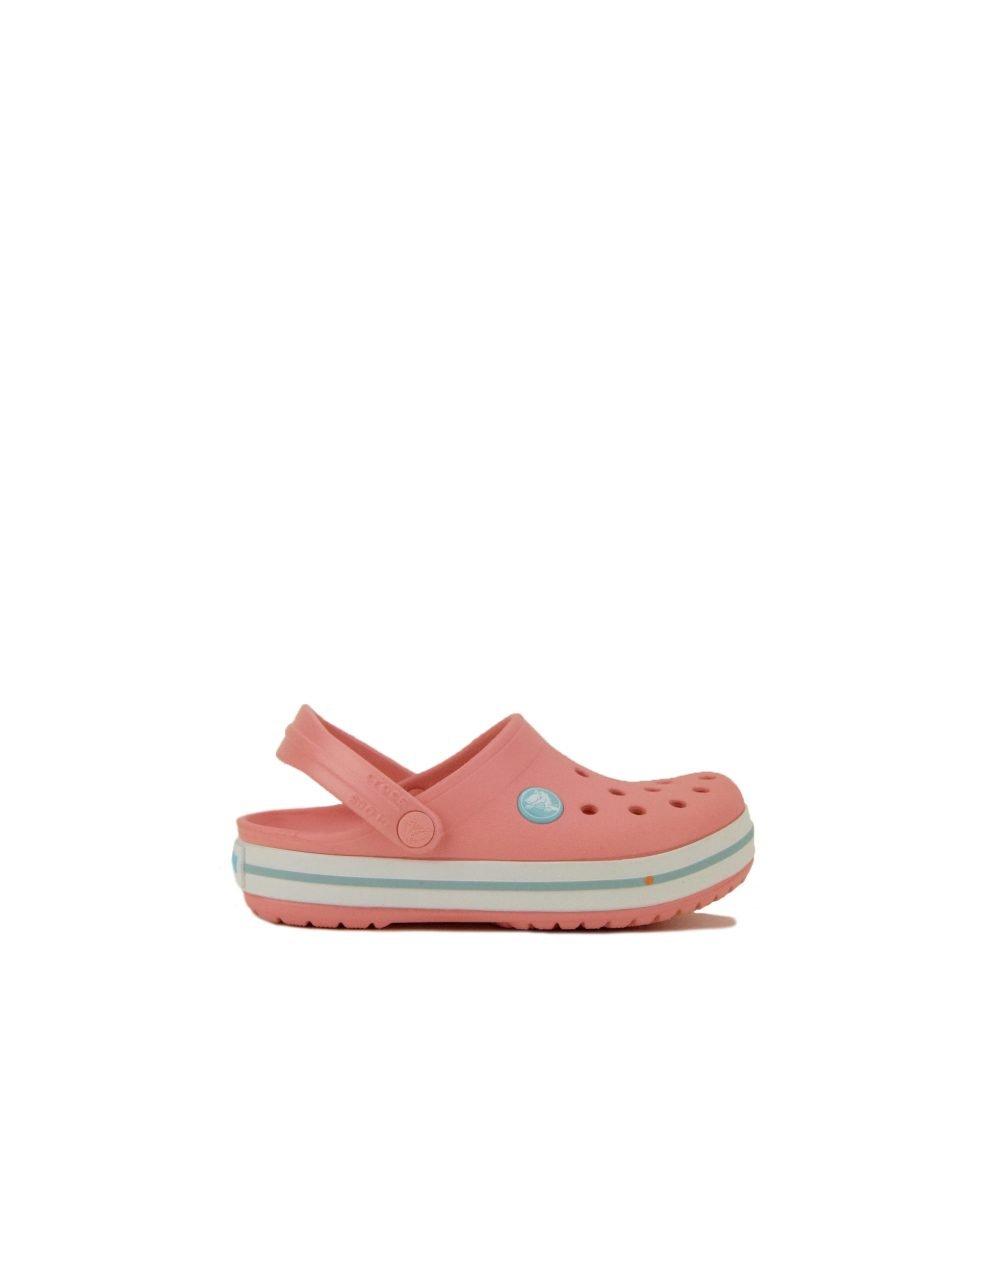 Crocs Crocband Clog Kids (204537-7H5) Melon/Ice Blue